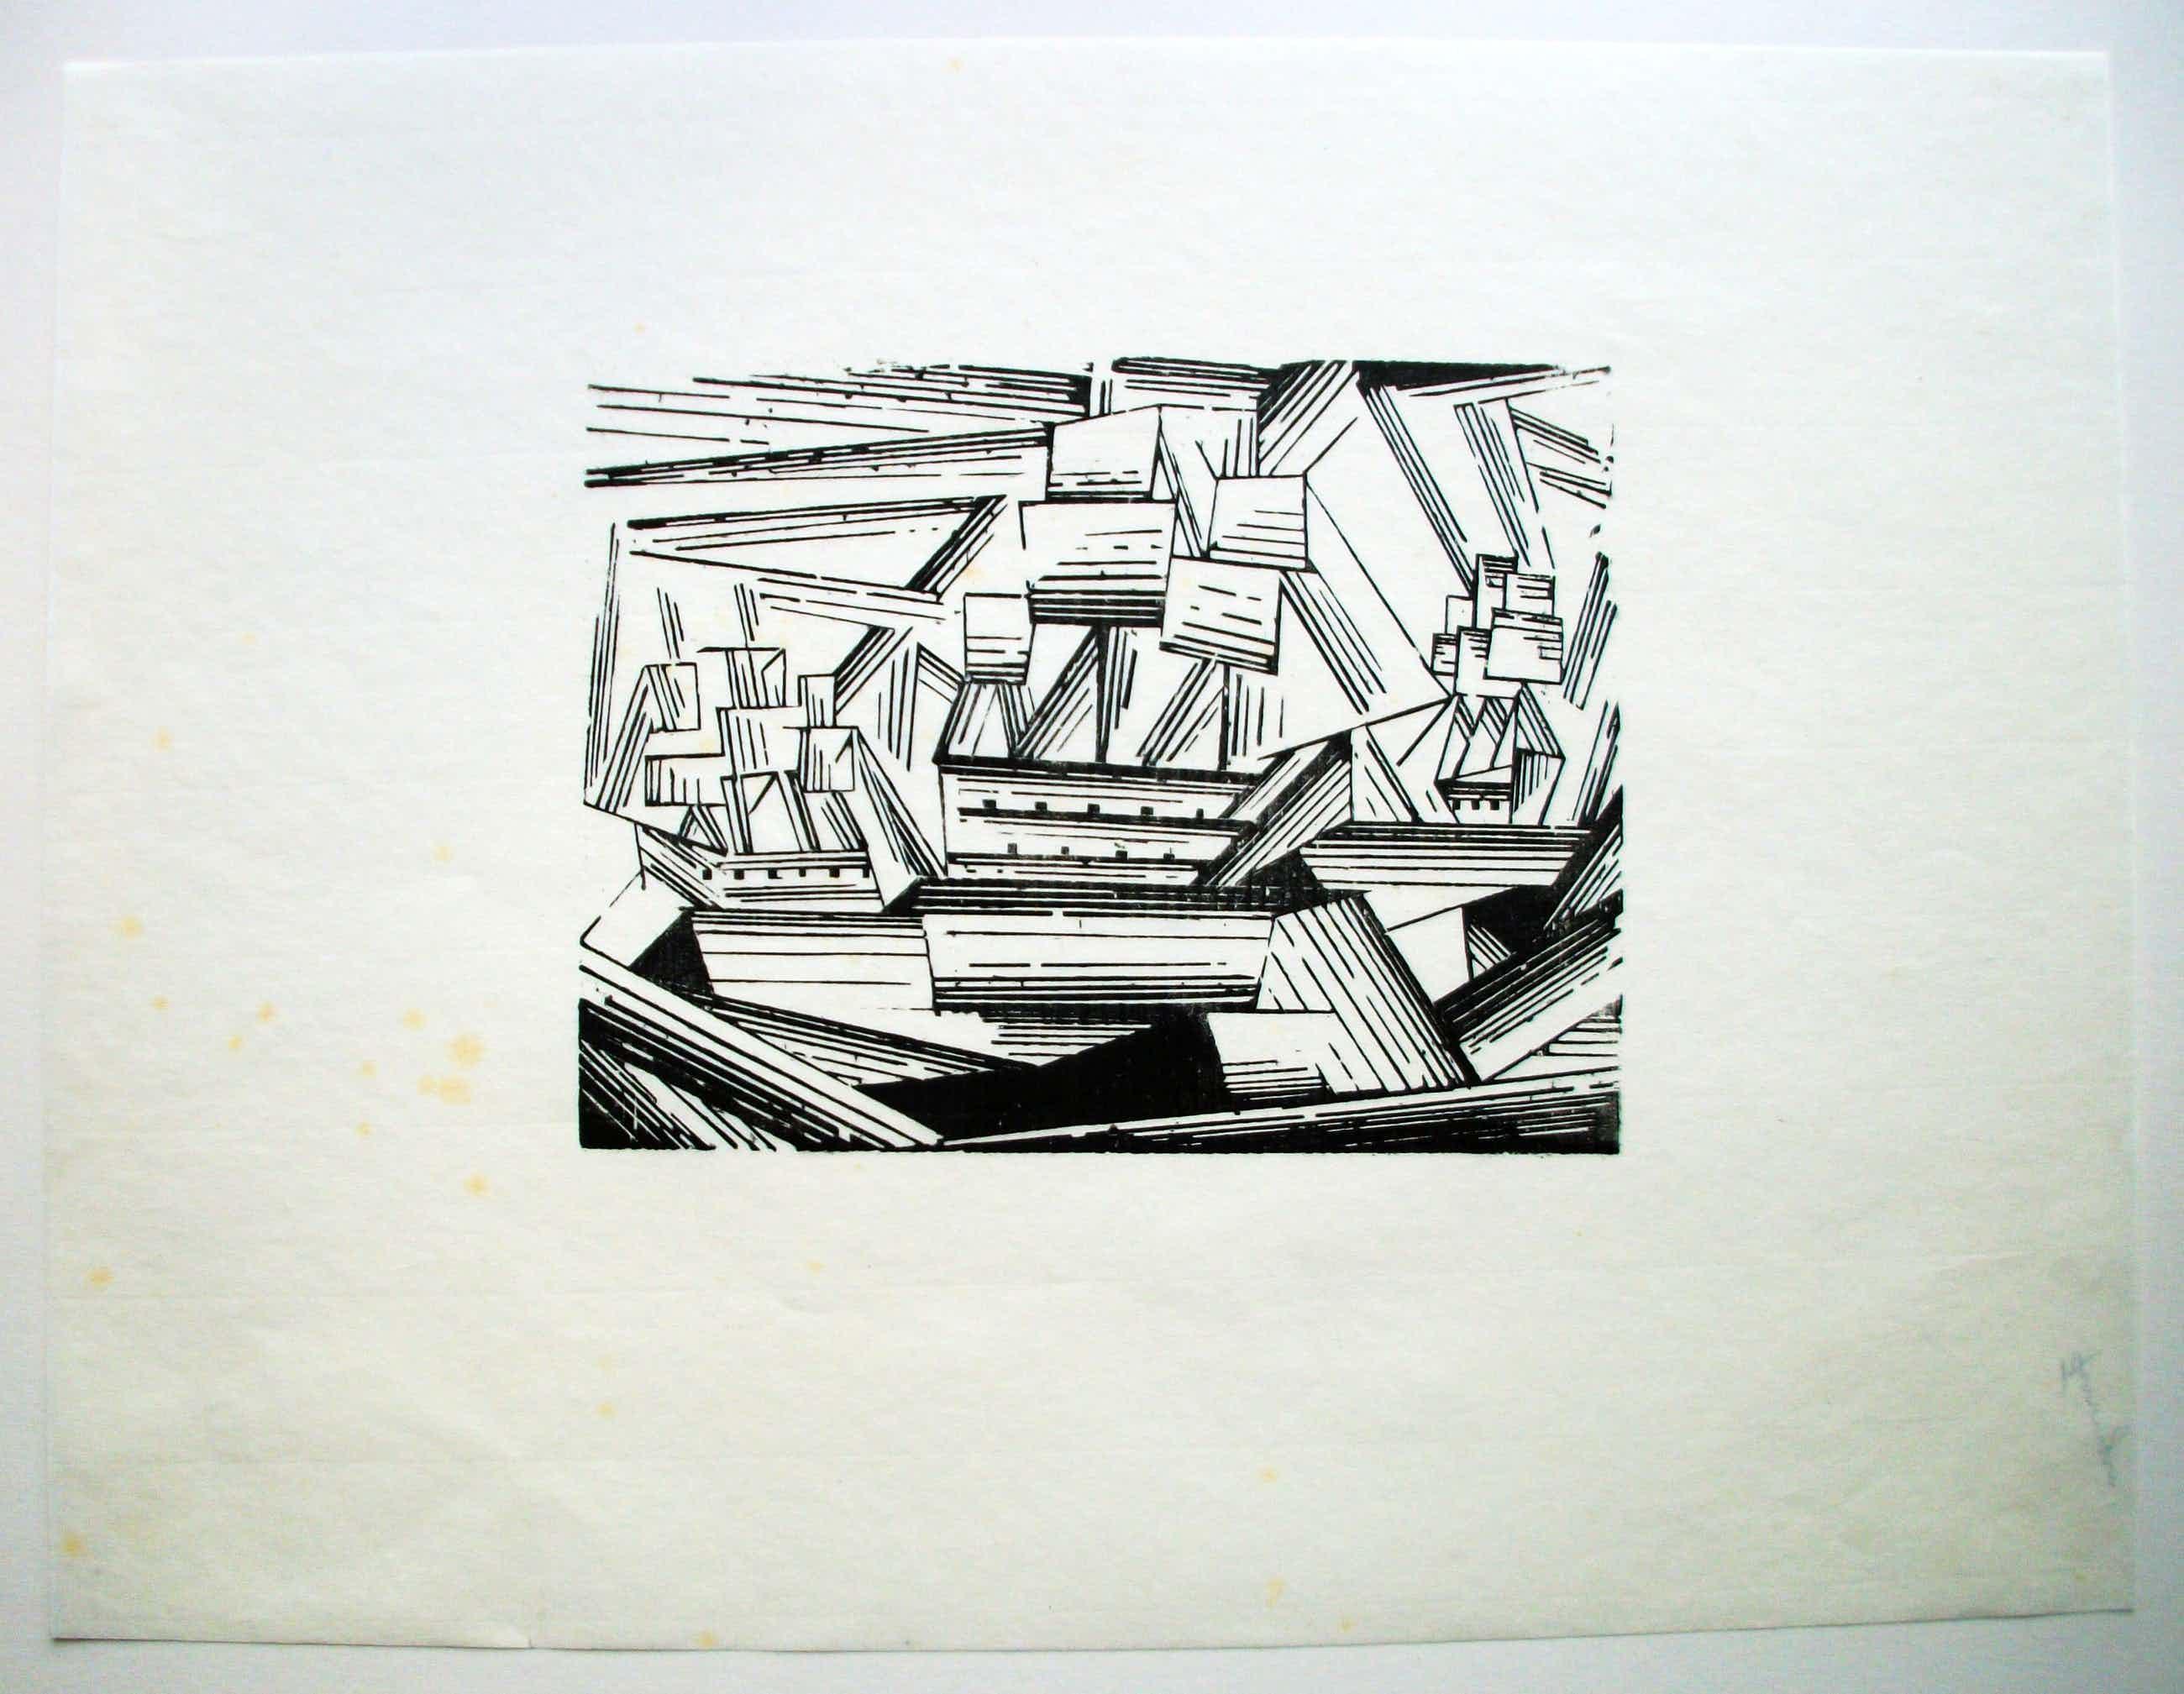 Lyonel Feininger - Kreuzende Segelschiffe Original Holzschnitt kopen? Bied vanaf 1780!